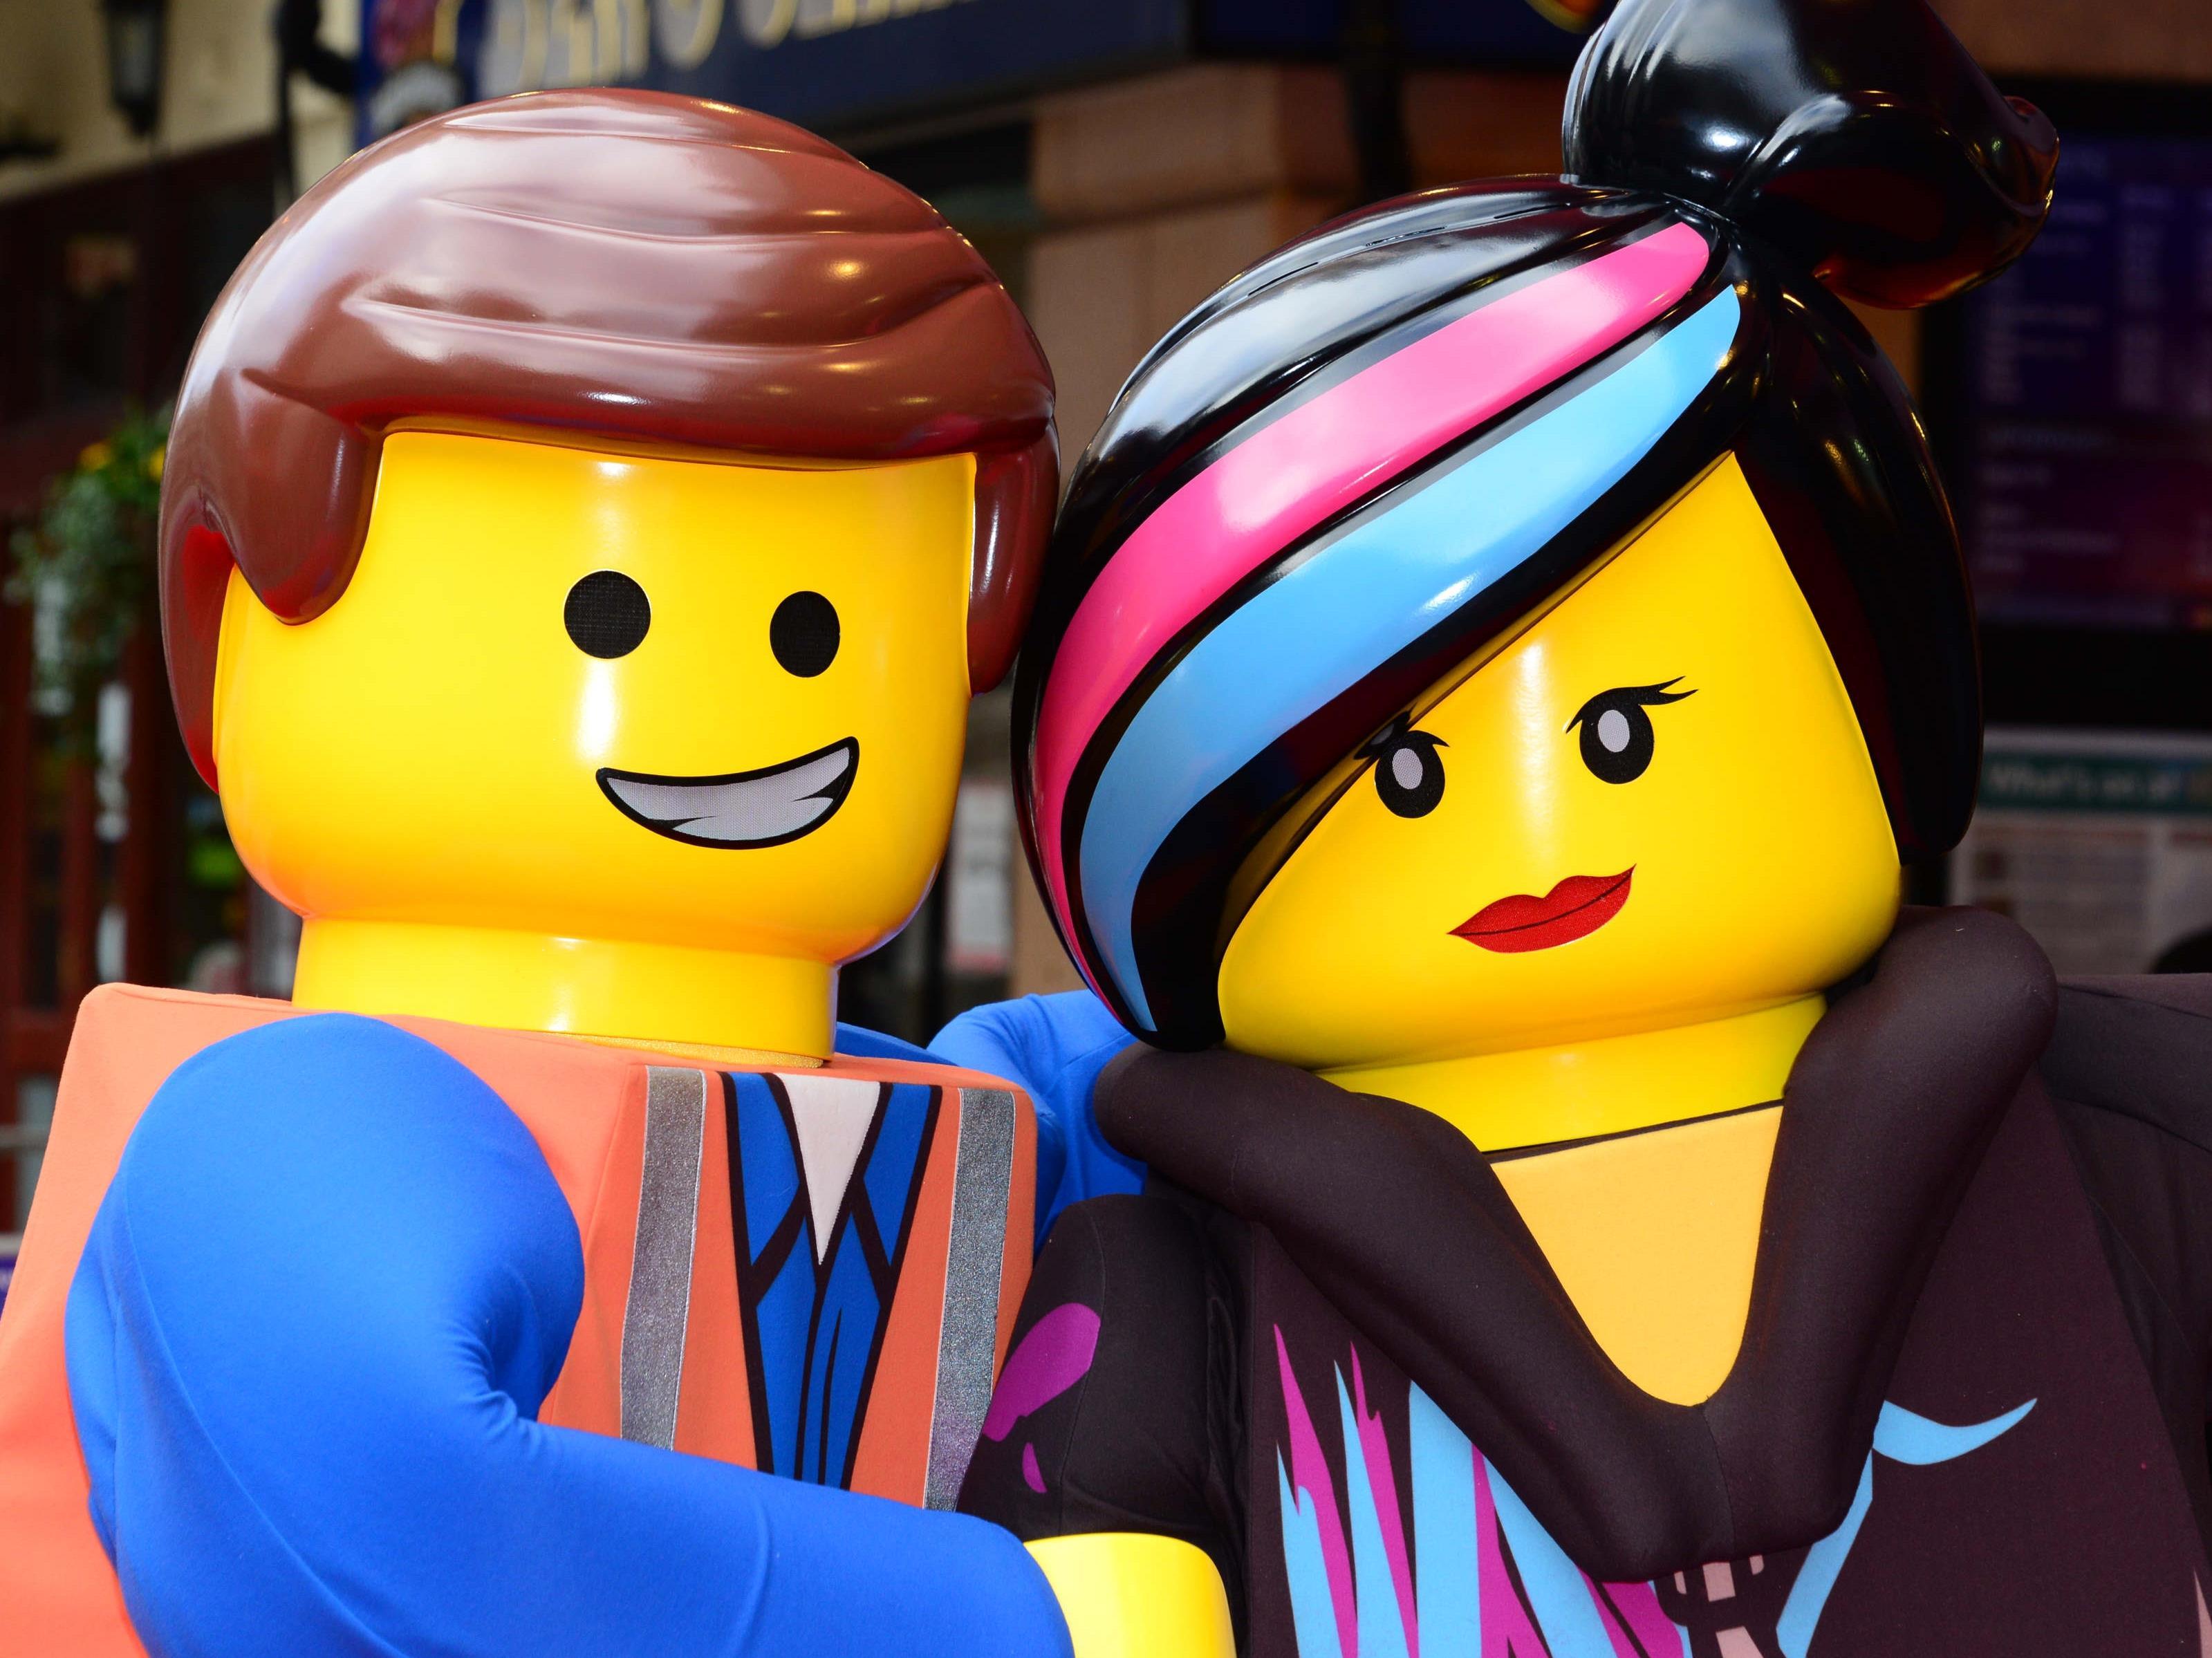 Klocki Lego Allegro Cena Lego Dania Newsweekpl Biznes